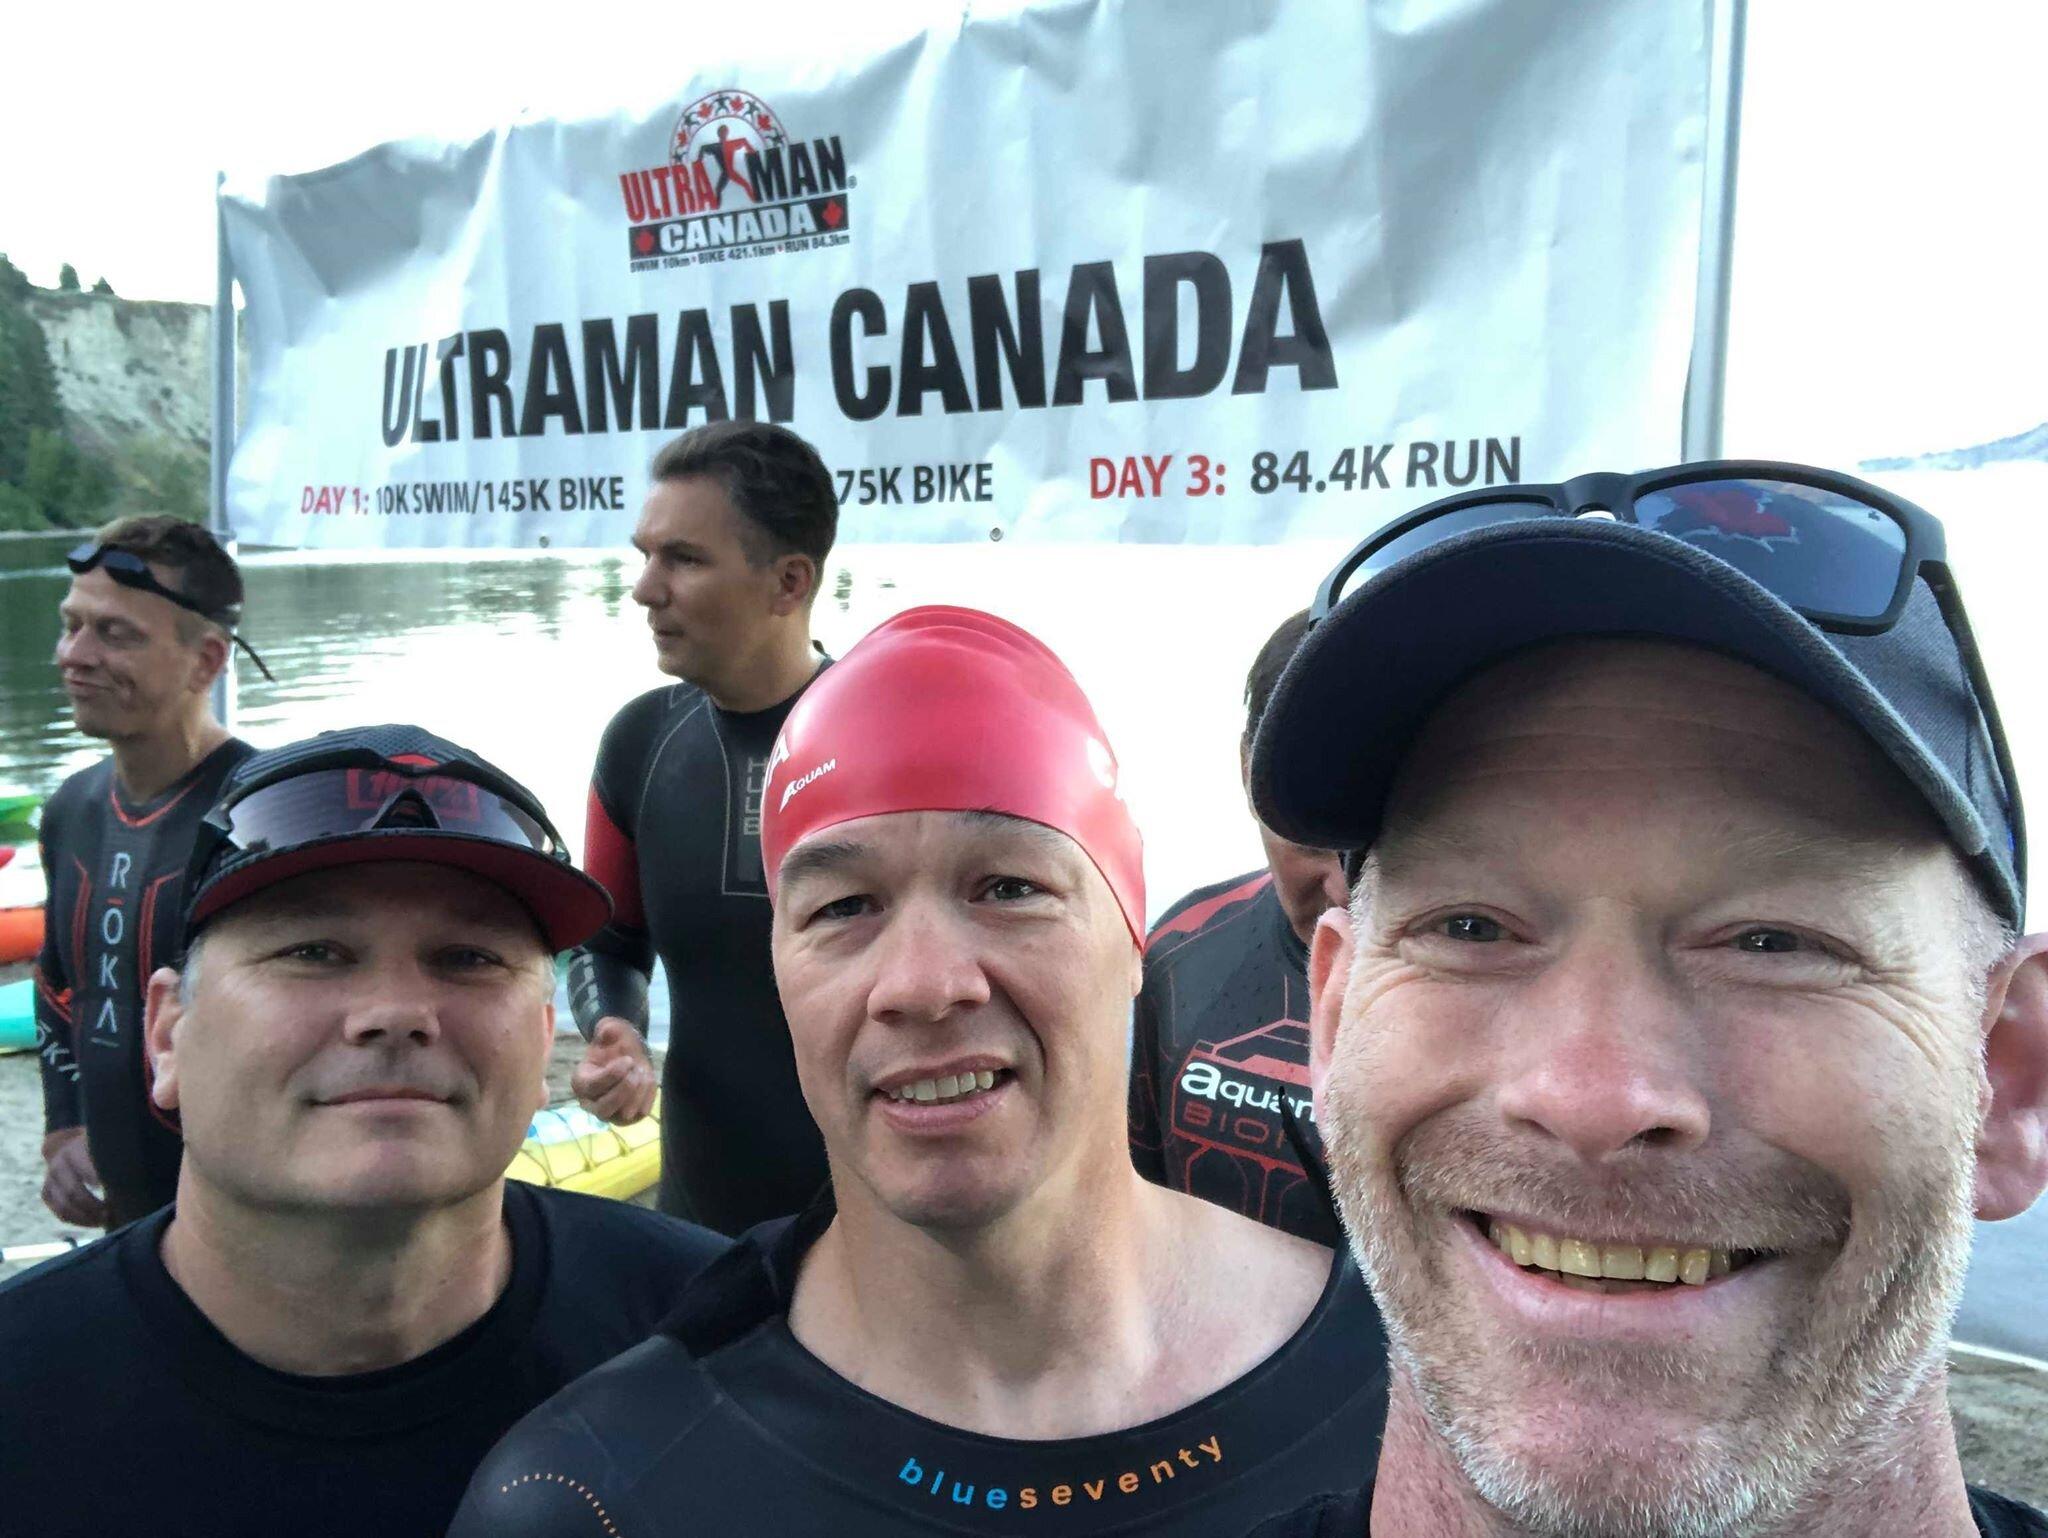 Coach_Terry_Wilson_Pursuit_of_The_Perfect_Race_Ultraman_Canada_Tim_Wilkinson_Swim_bike_Run_17.jpg